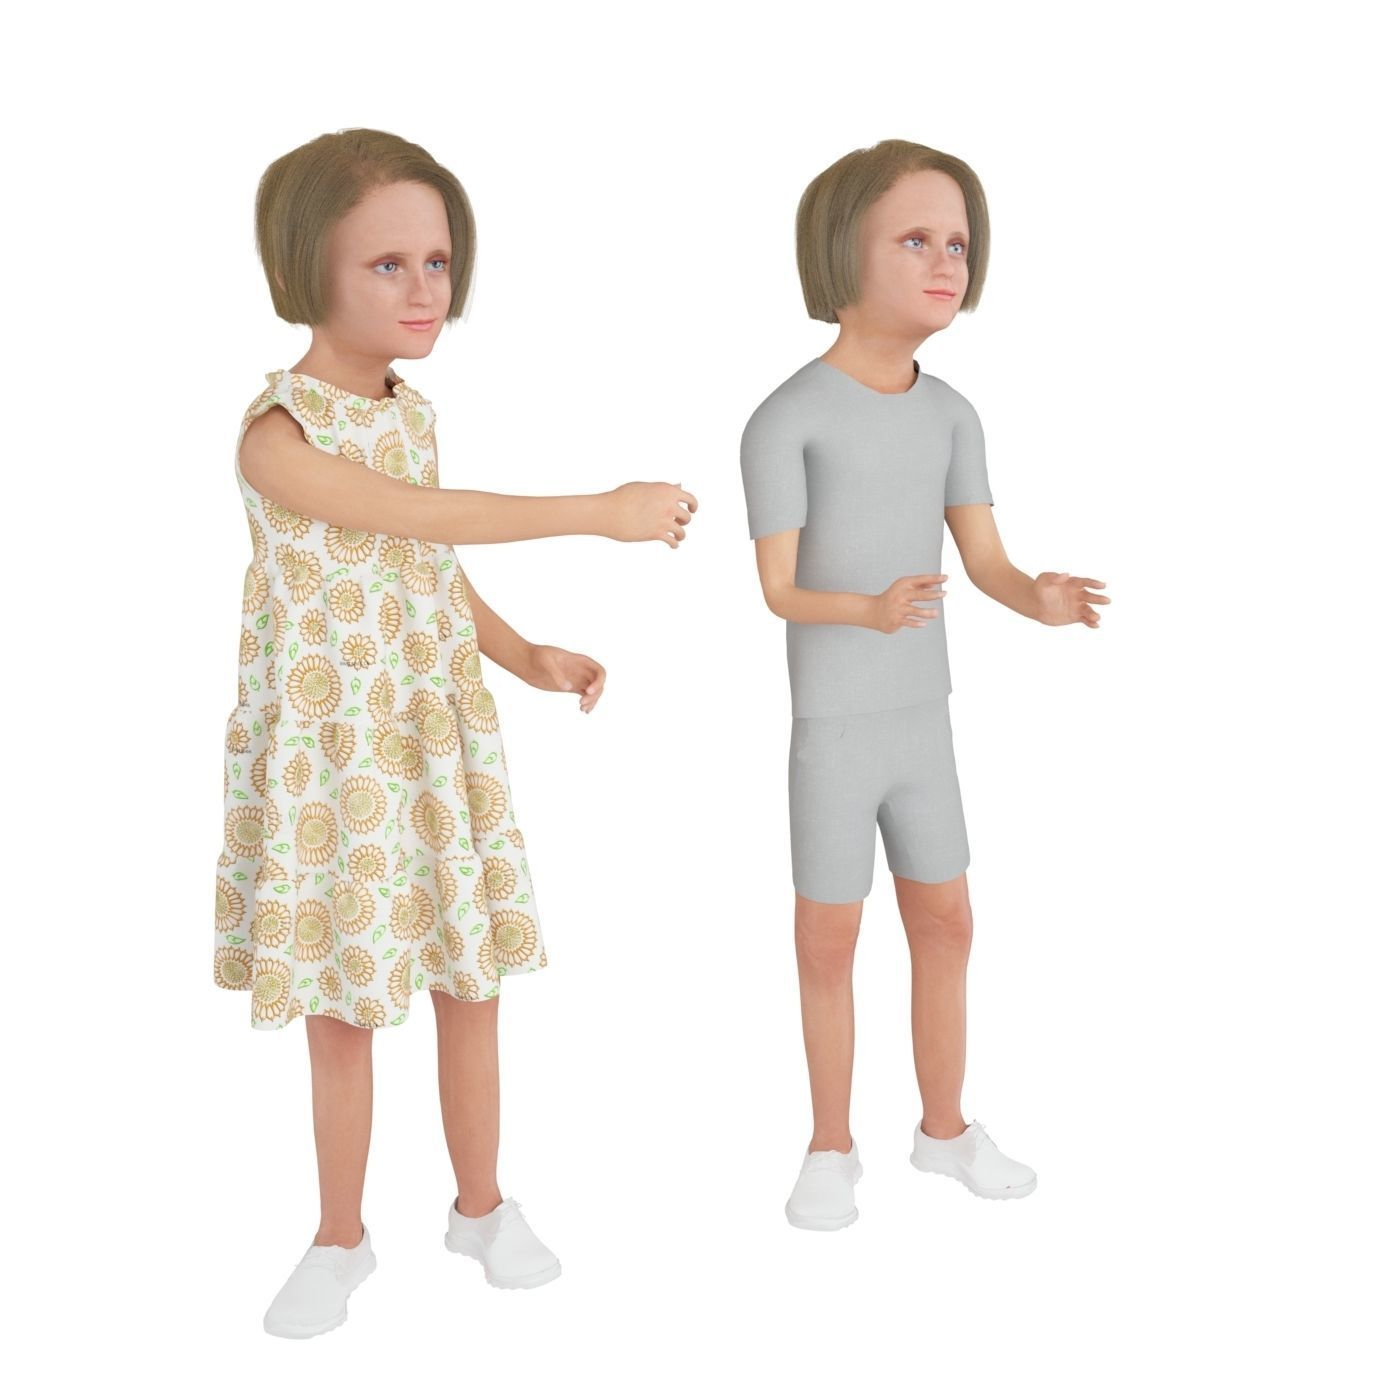 Girl real cloth simulation conversation loop animation 3